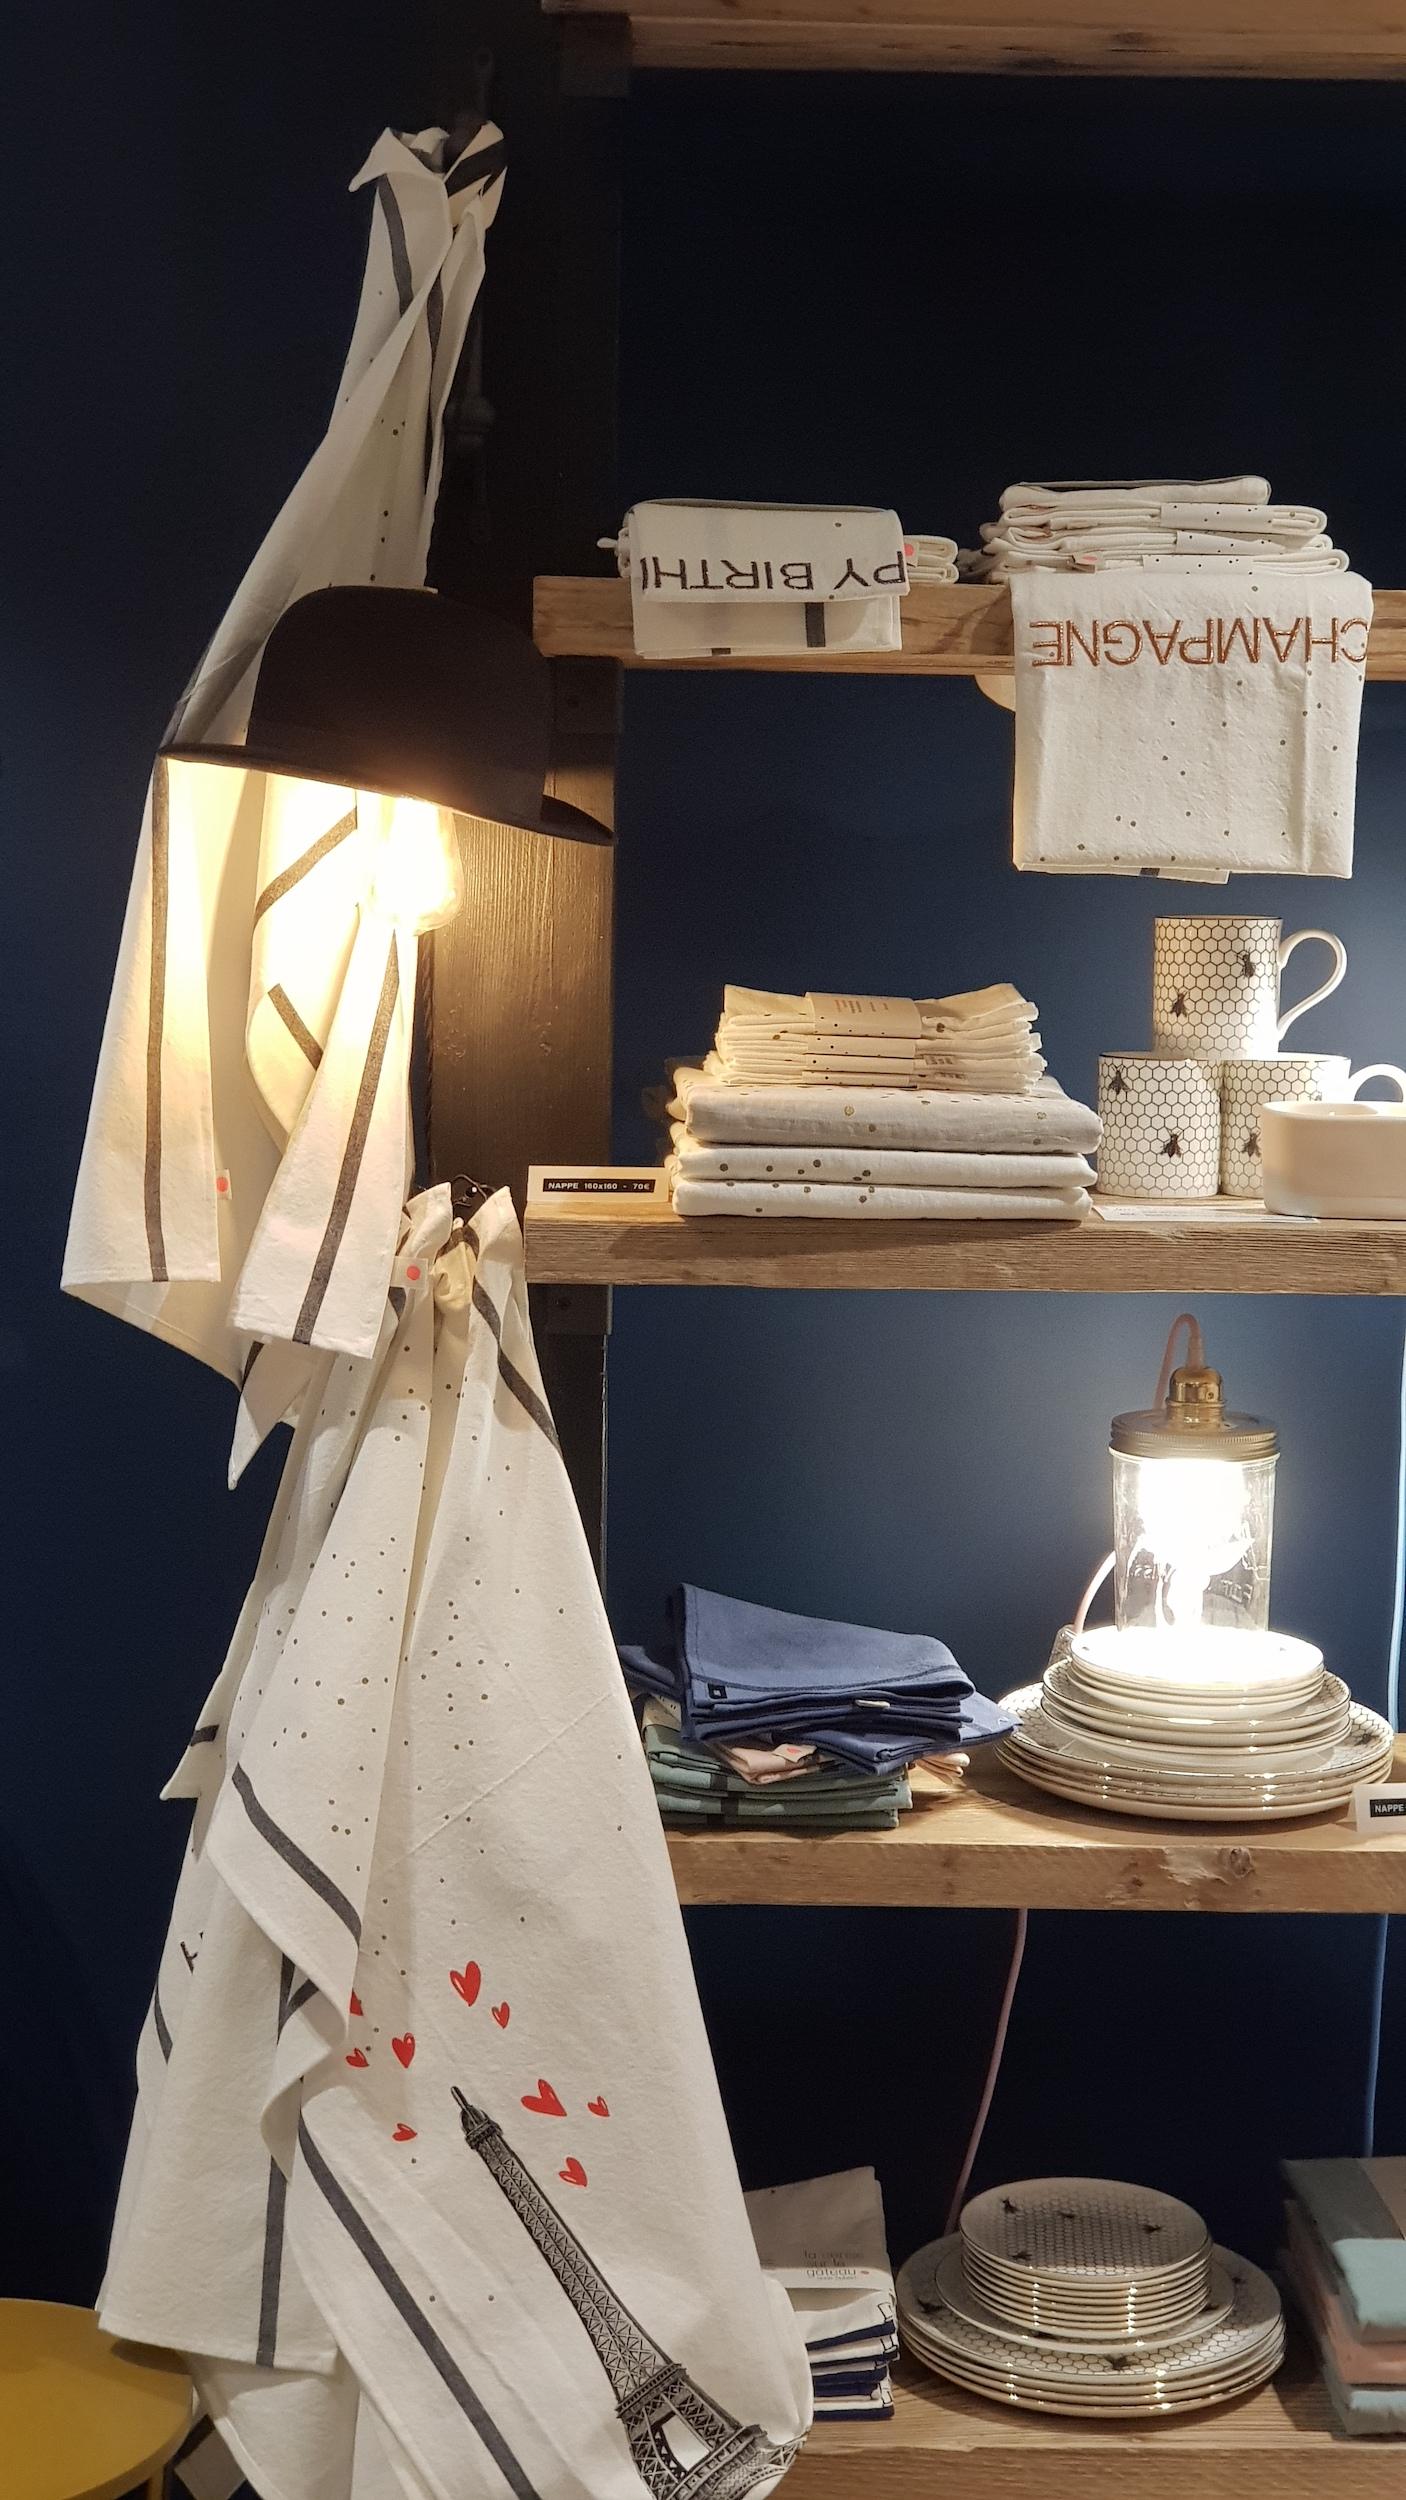 Renovation-boutique-decoration-lagny-77-carre-8-original